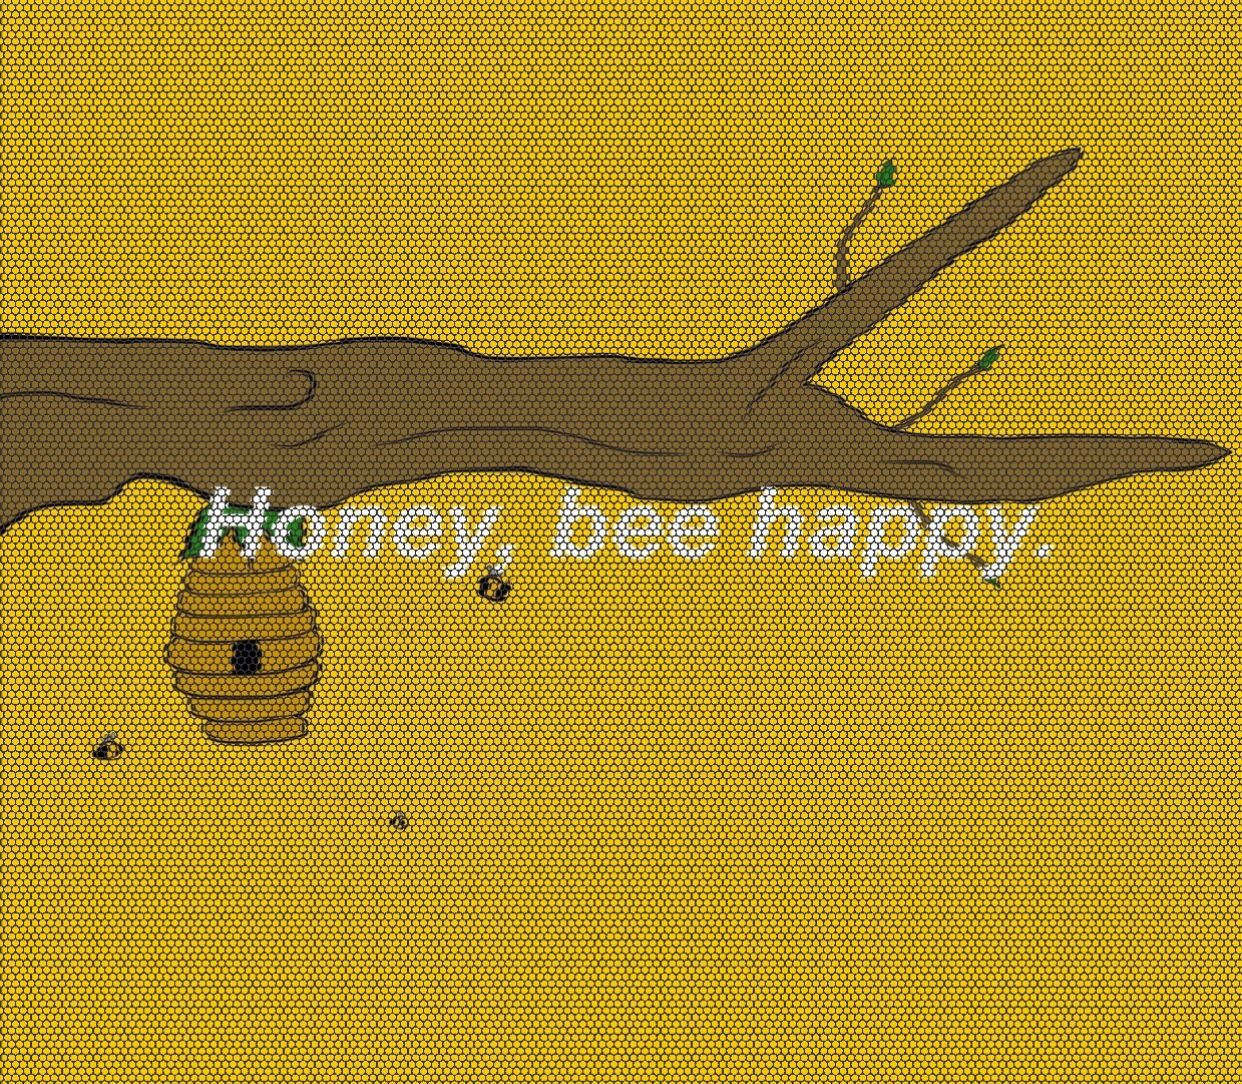 Milk And Honey Quote Wallpapers Honeybee Bee Yellow Aesthetic Background Edit